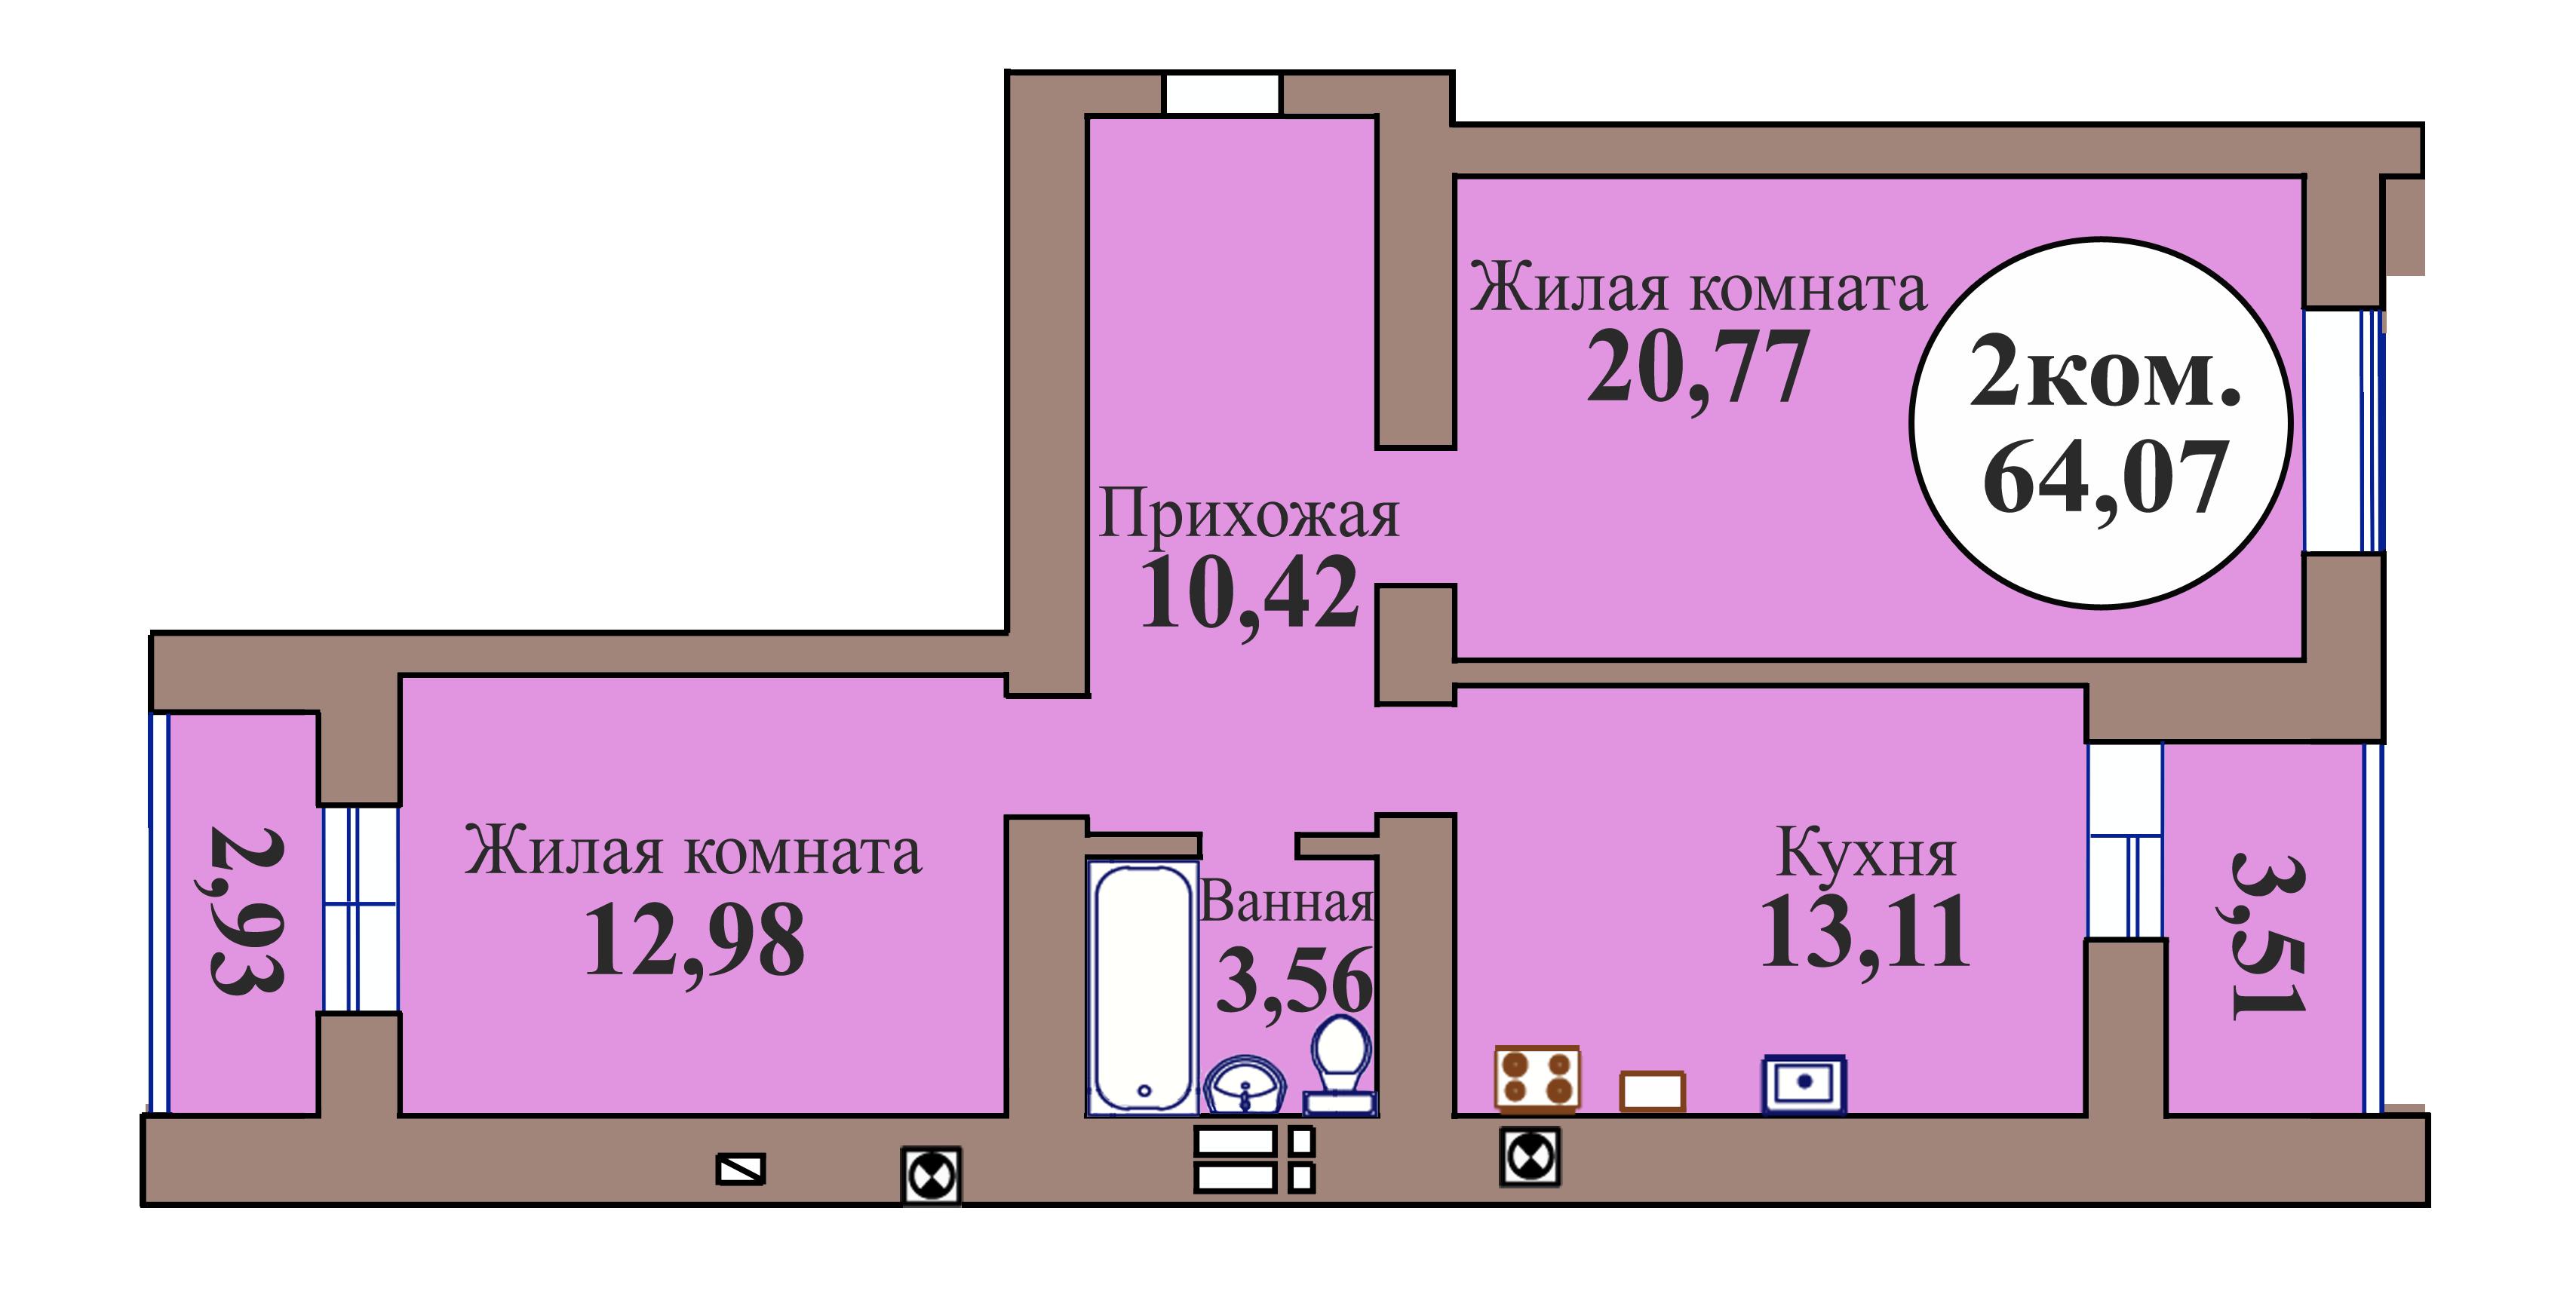 2-комн. кв. по пер. Калининградский, 5 кв. 149 в Калининграде